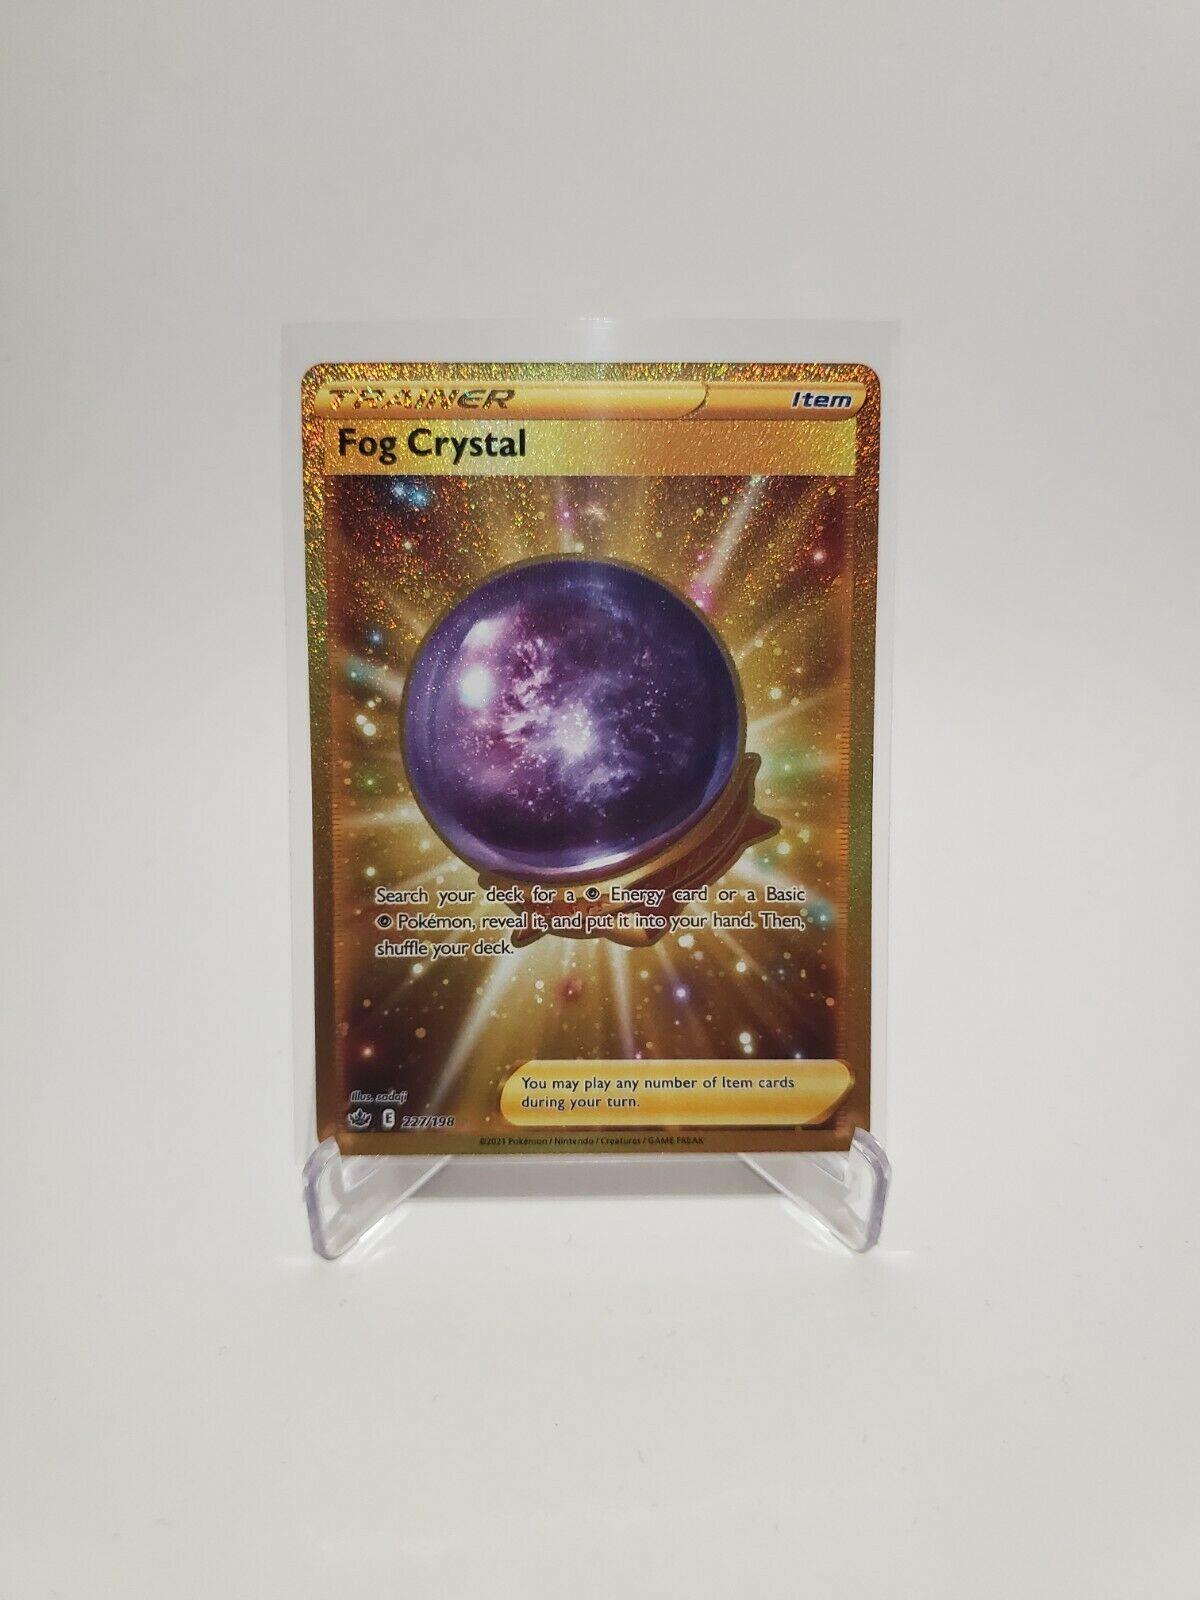 Fog Crystal Gold Secret Rare Trainer Card 227/198 Chilling Reign (NM)(Mint)